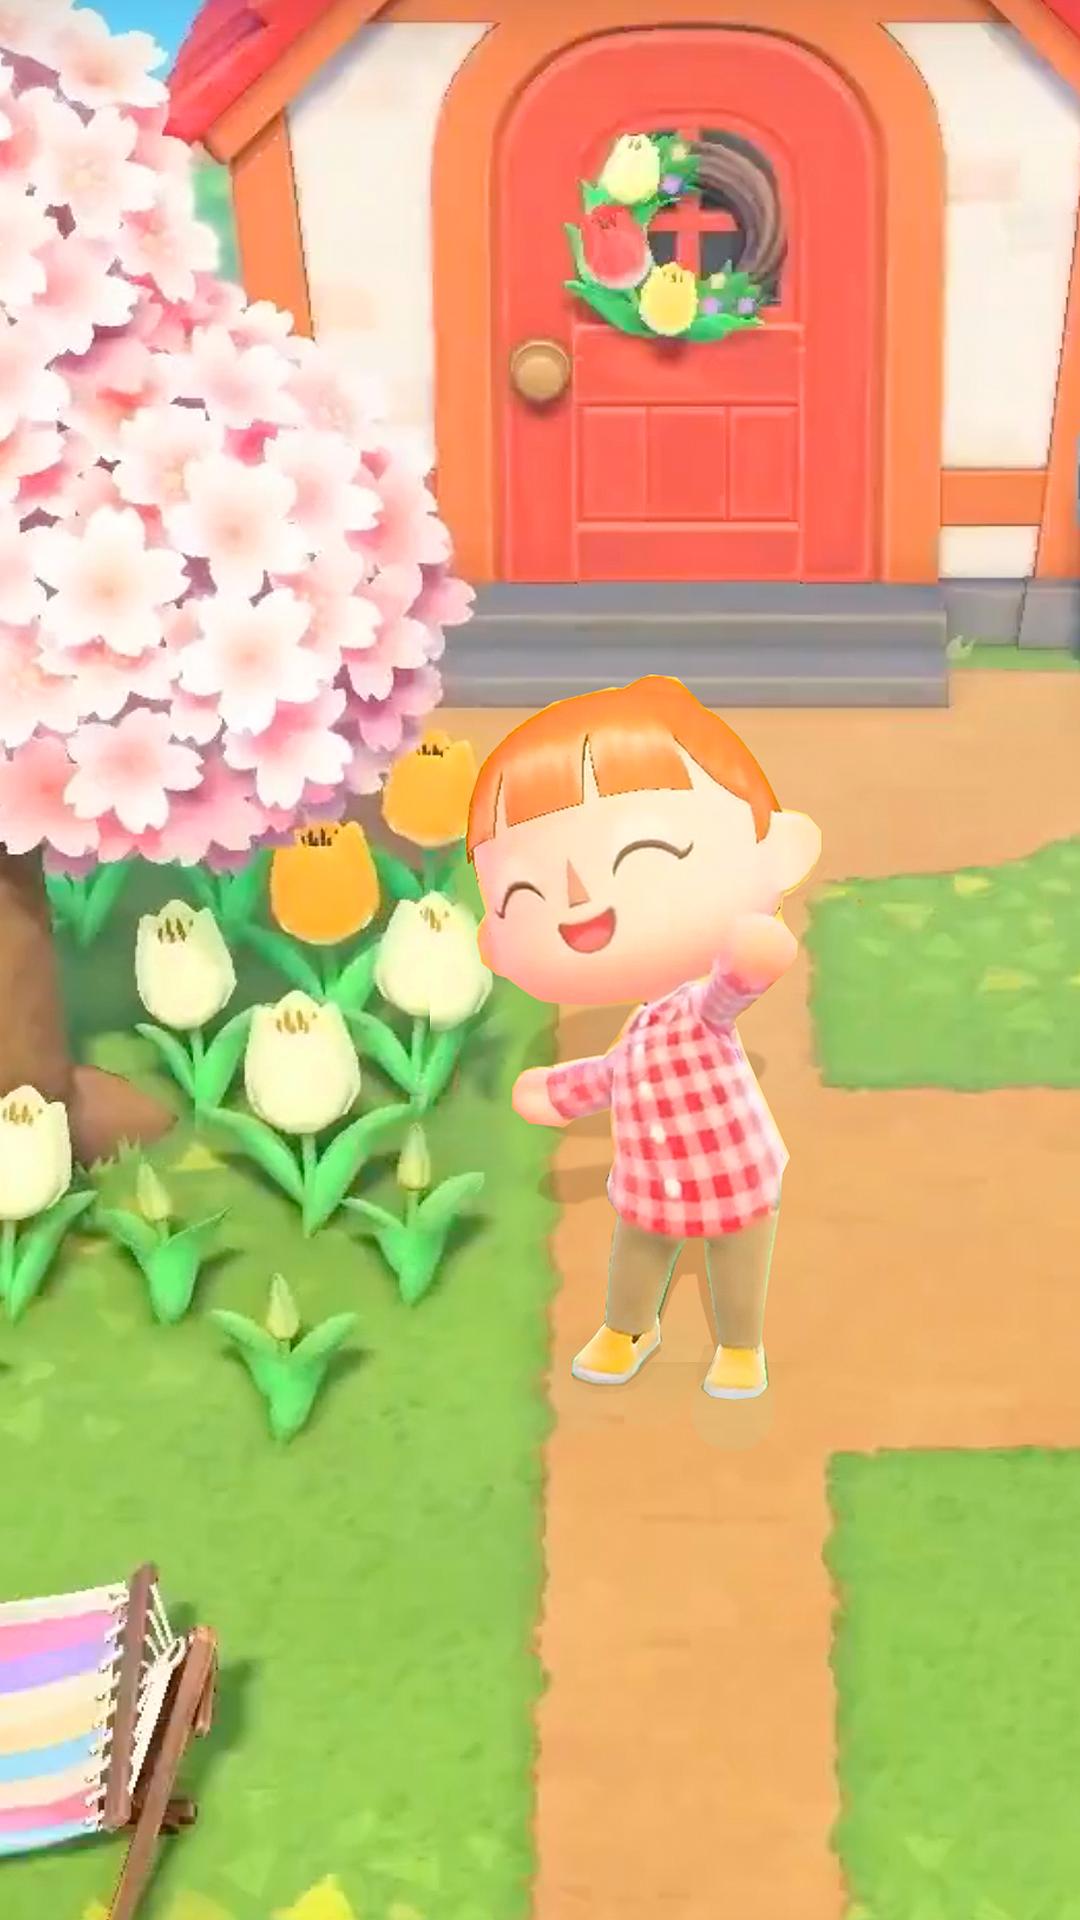 Adorable Animal Crossing New Horizons Wallpaper Mypotatogames